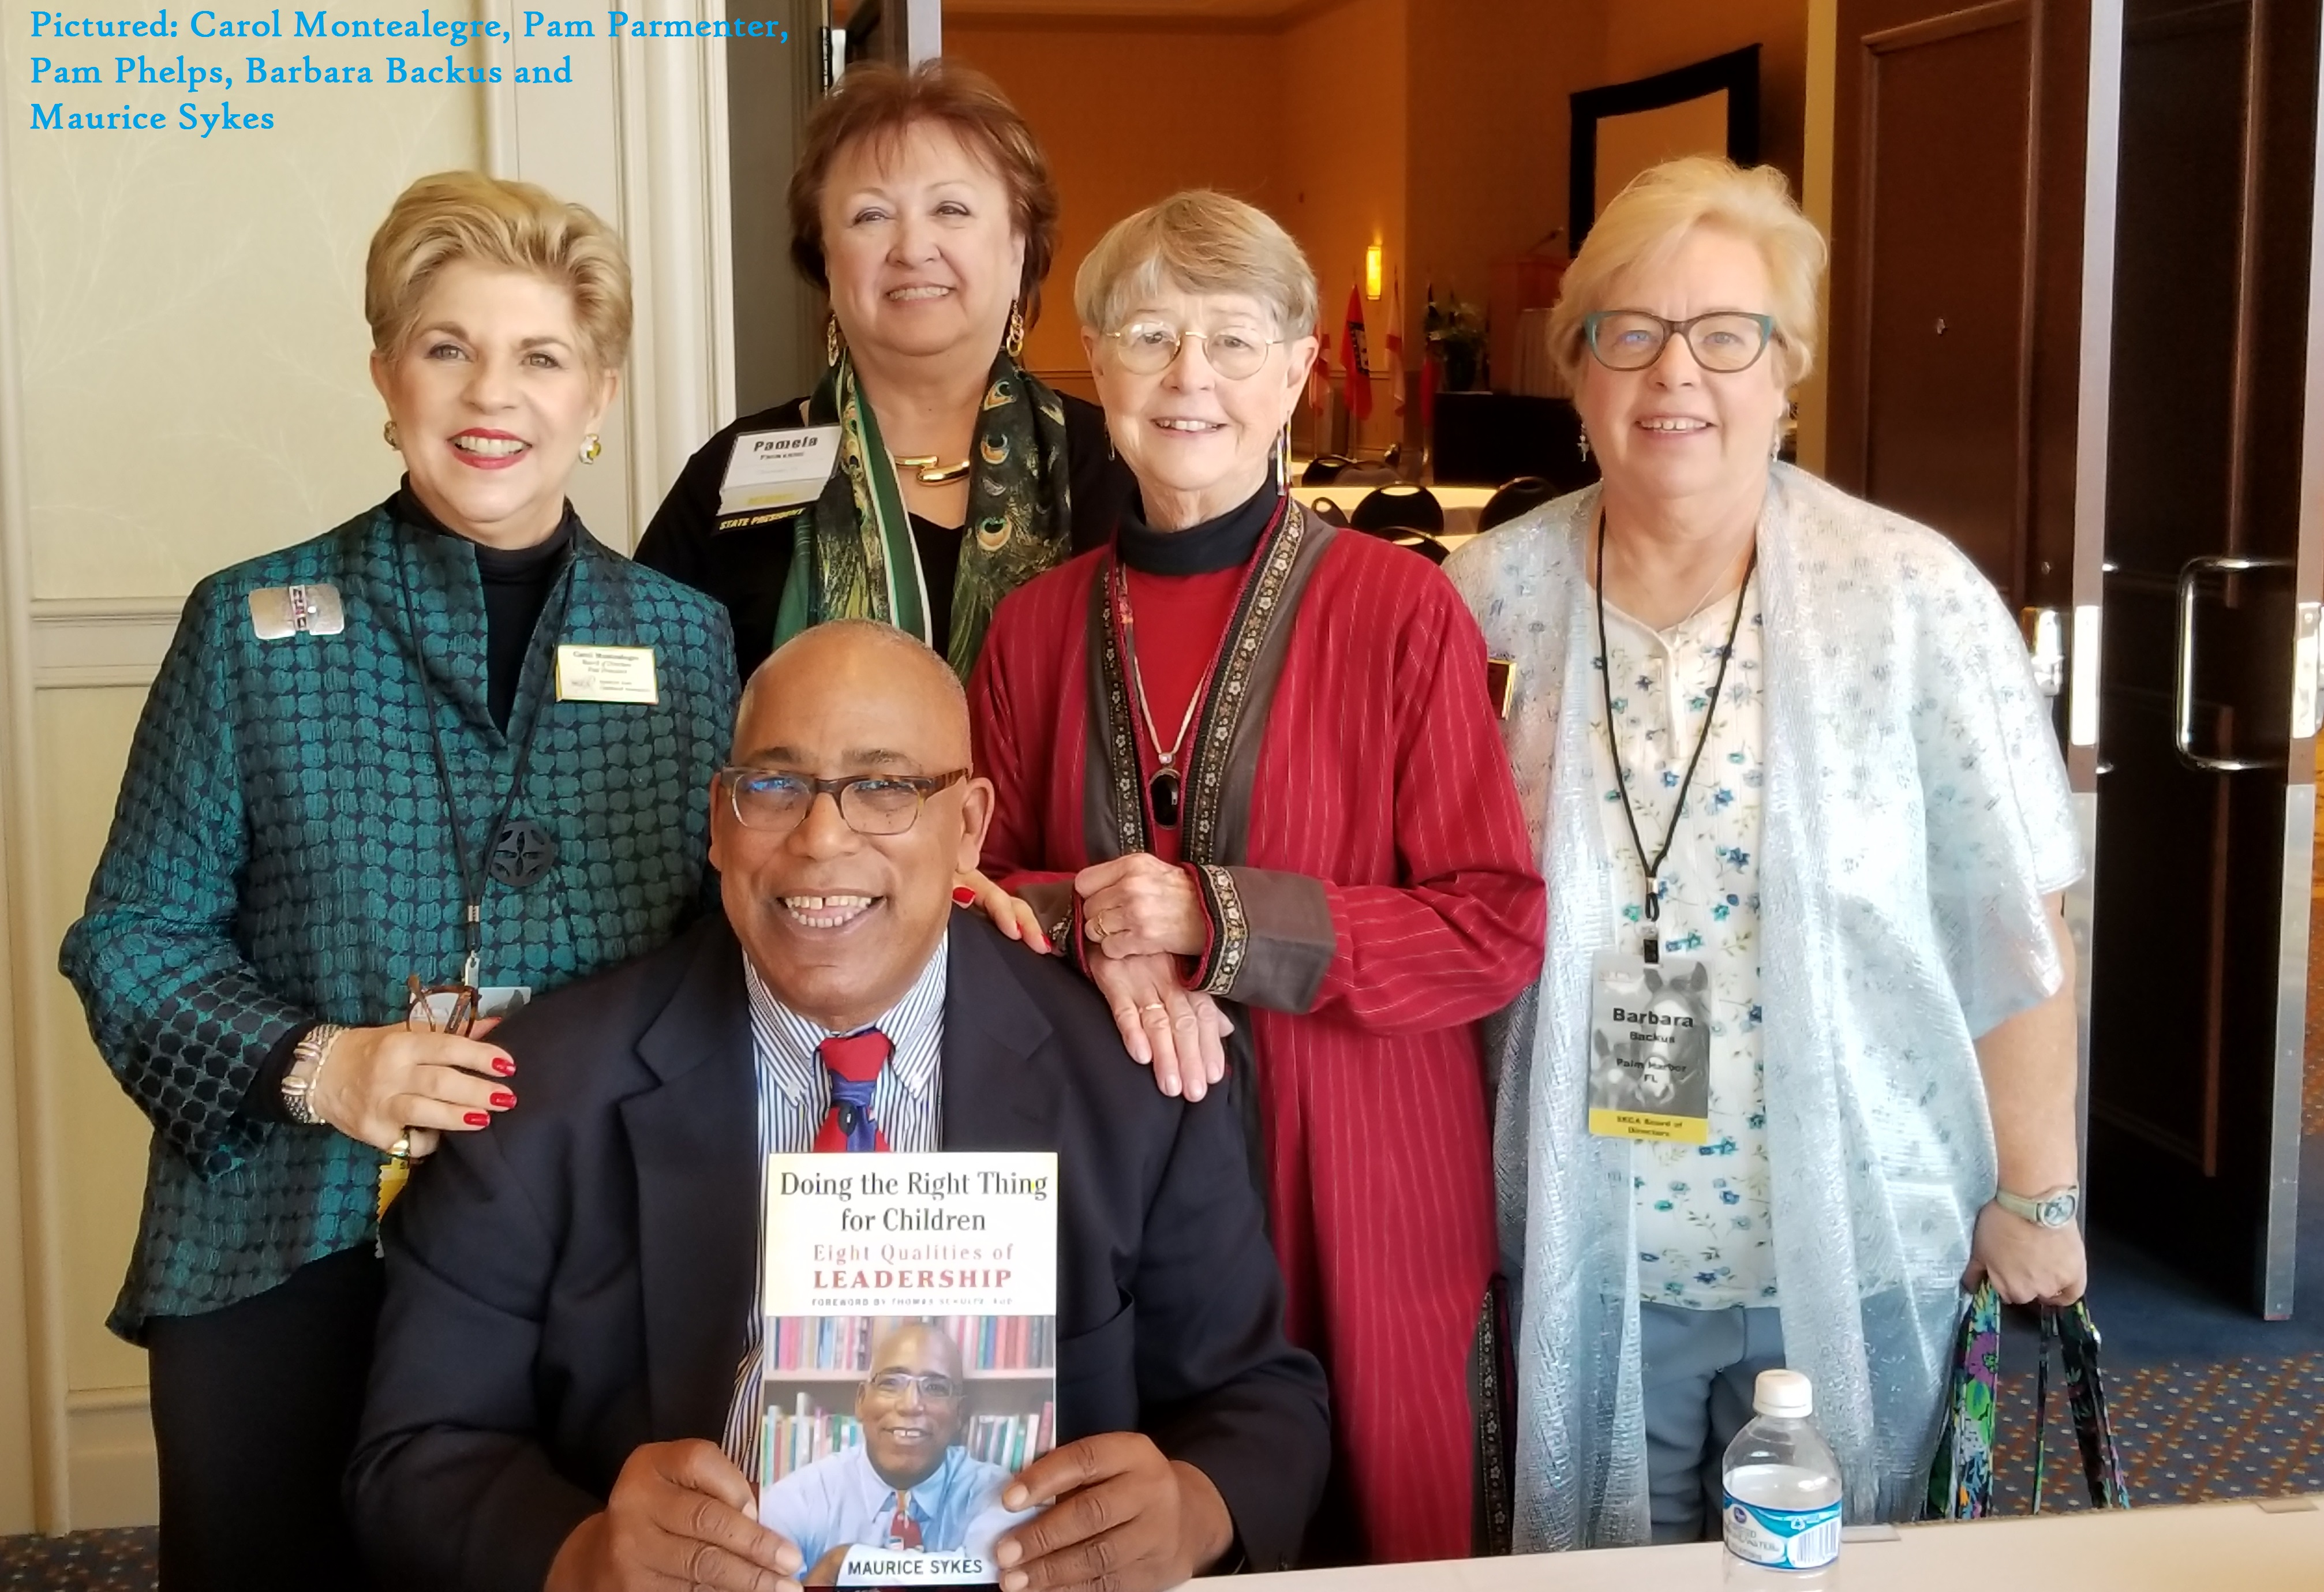 Carol Montealegre, Pam Parmenter, Pam Phelps, Barbara Backus, Maurice Sy...